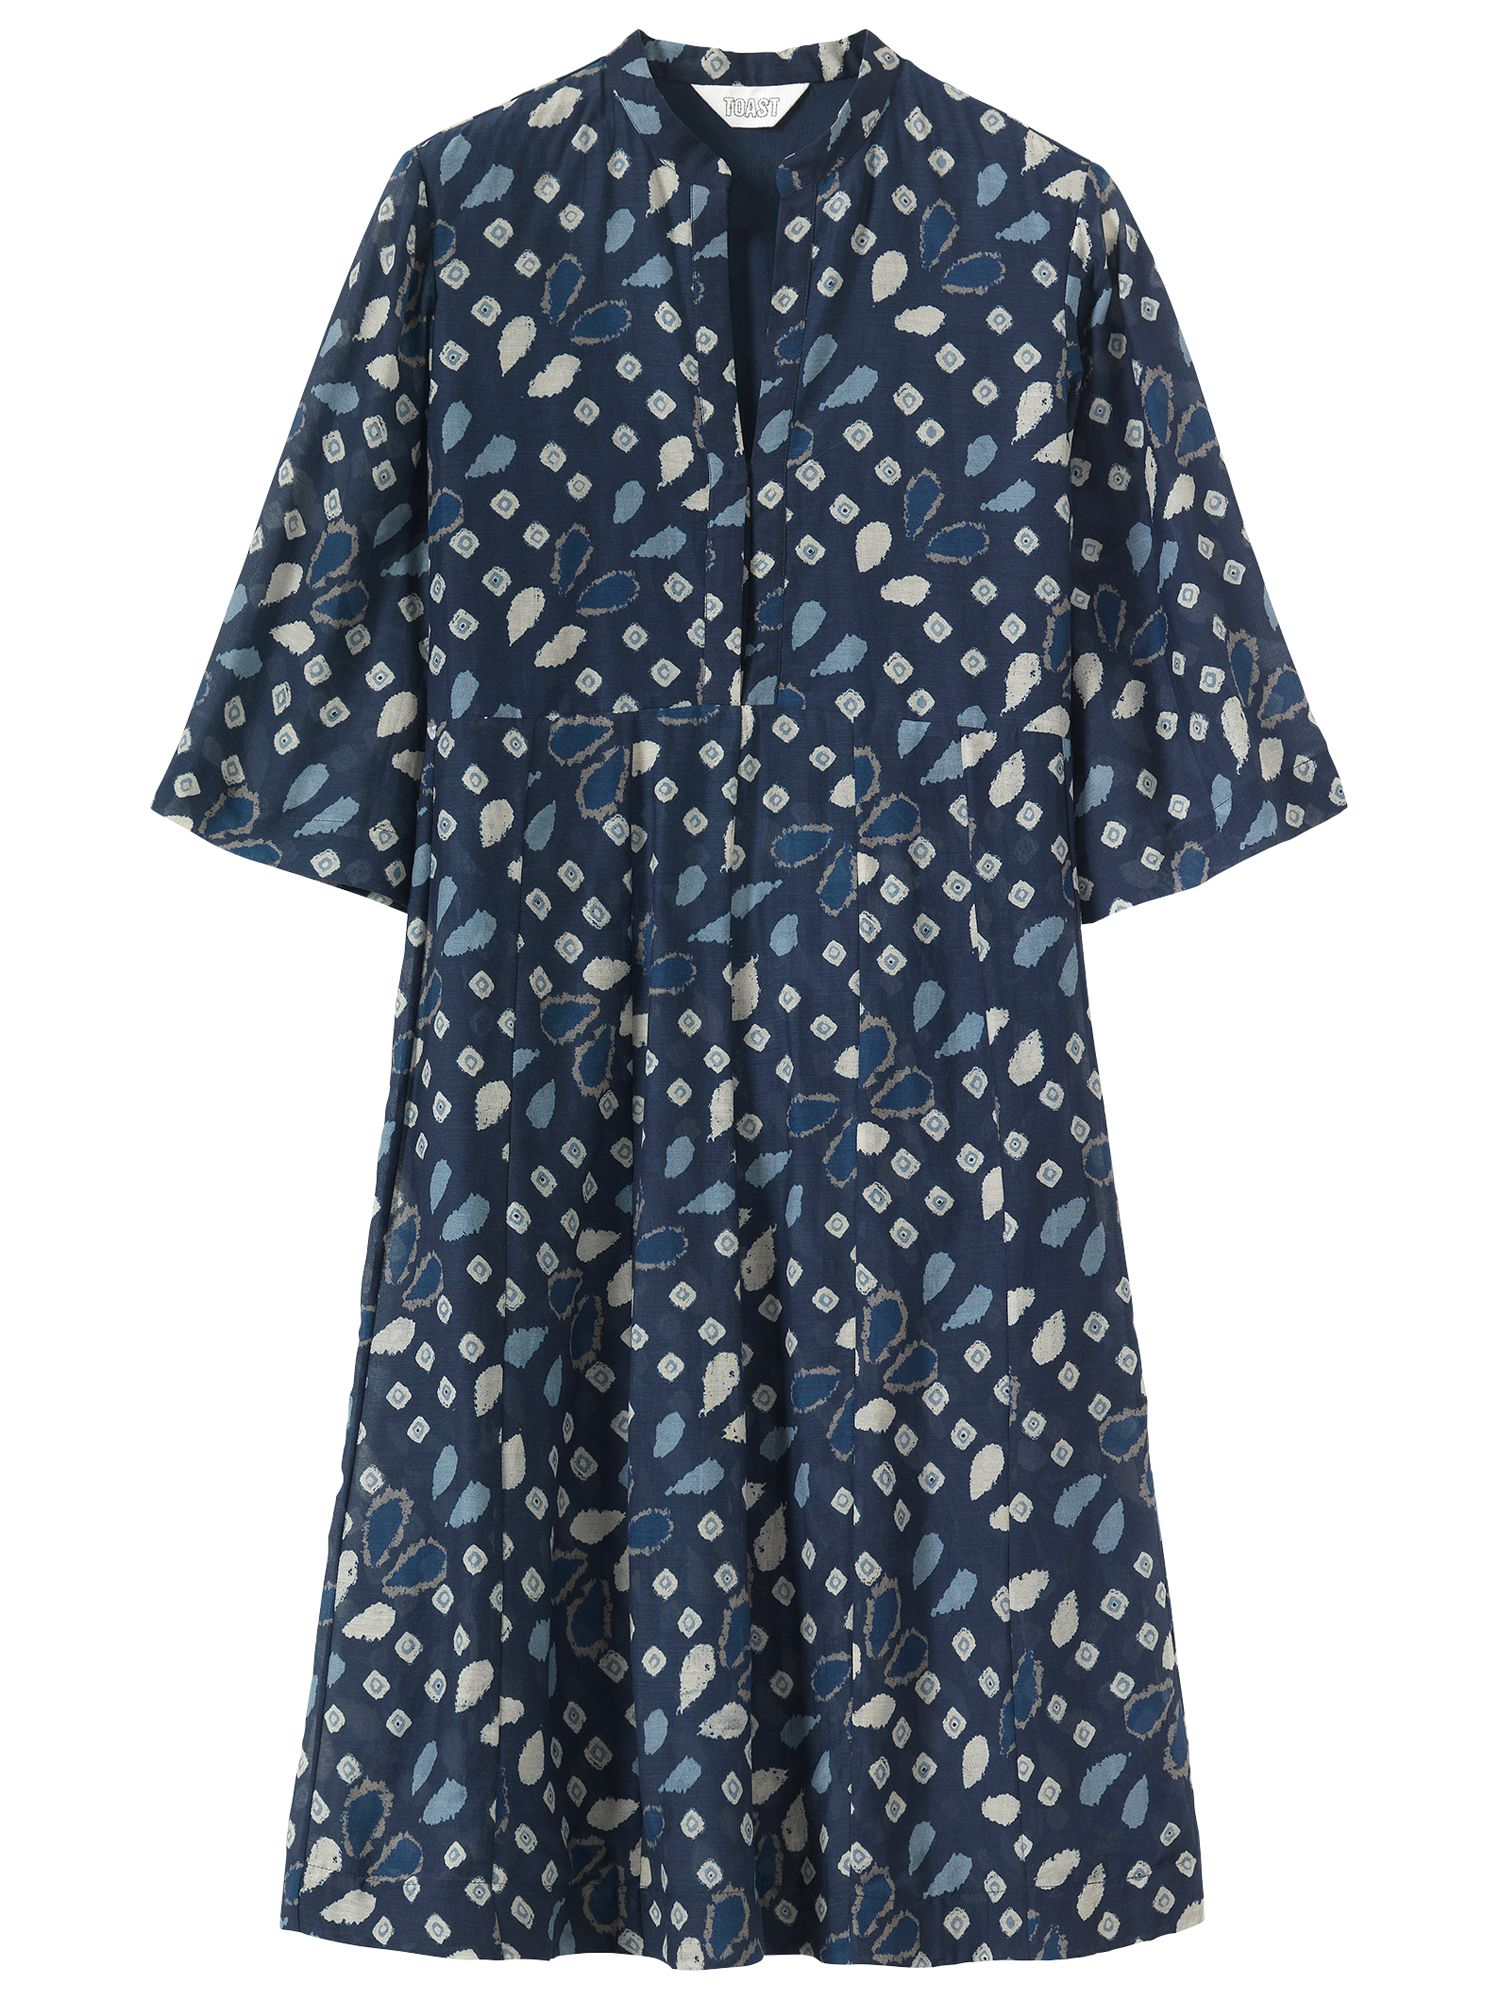 Ladakh blue dress